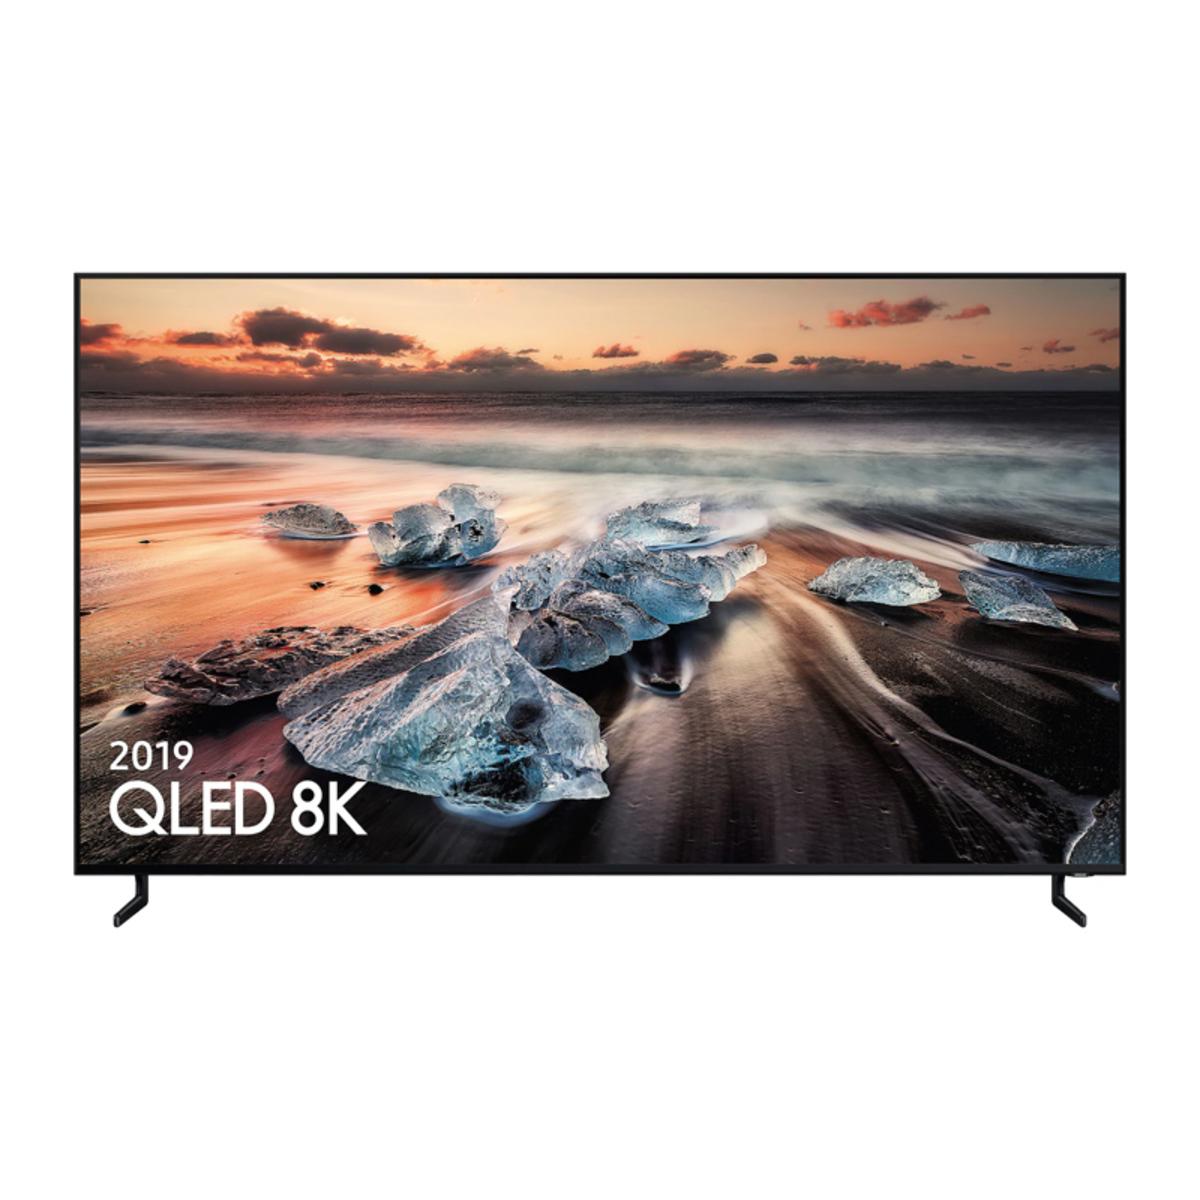 "Samsung QE55Q950RBTXXU 55"" Q950R Flagship QLED 8K HDR 3000 Smart TV + Free Samsung Galaxy note 10+ 5G £1,999 @ PRC Direct"